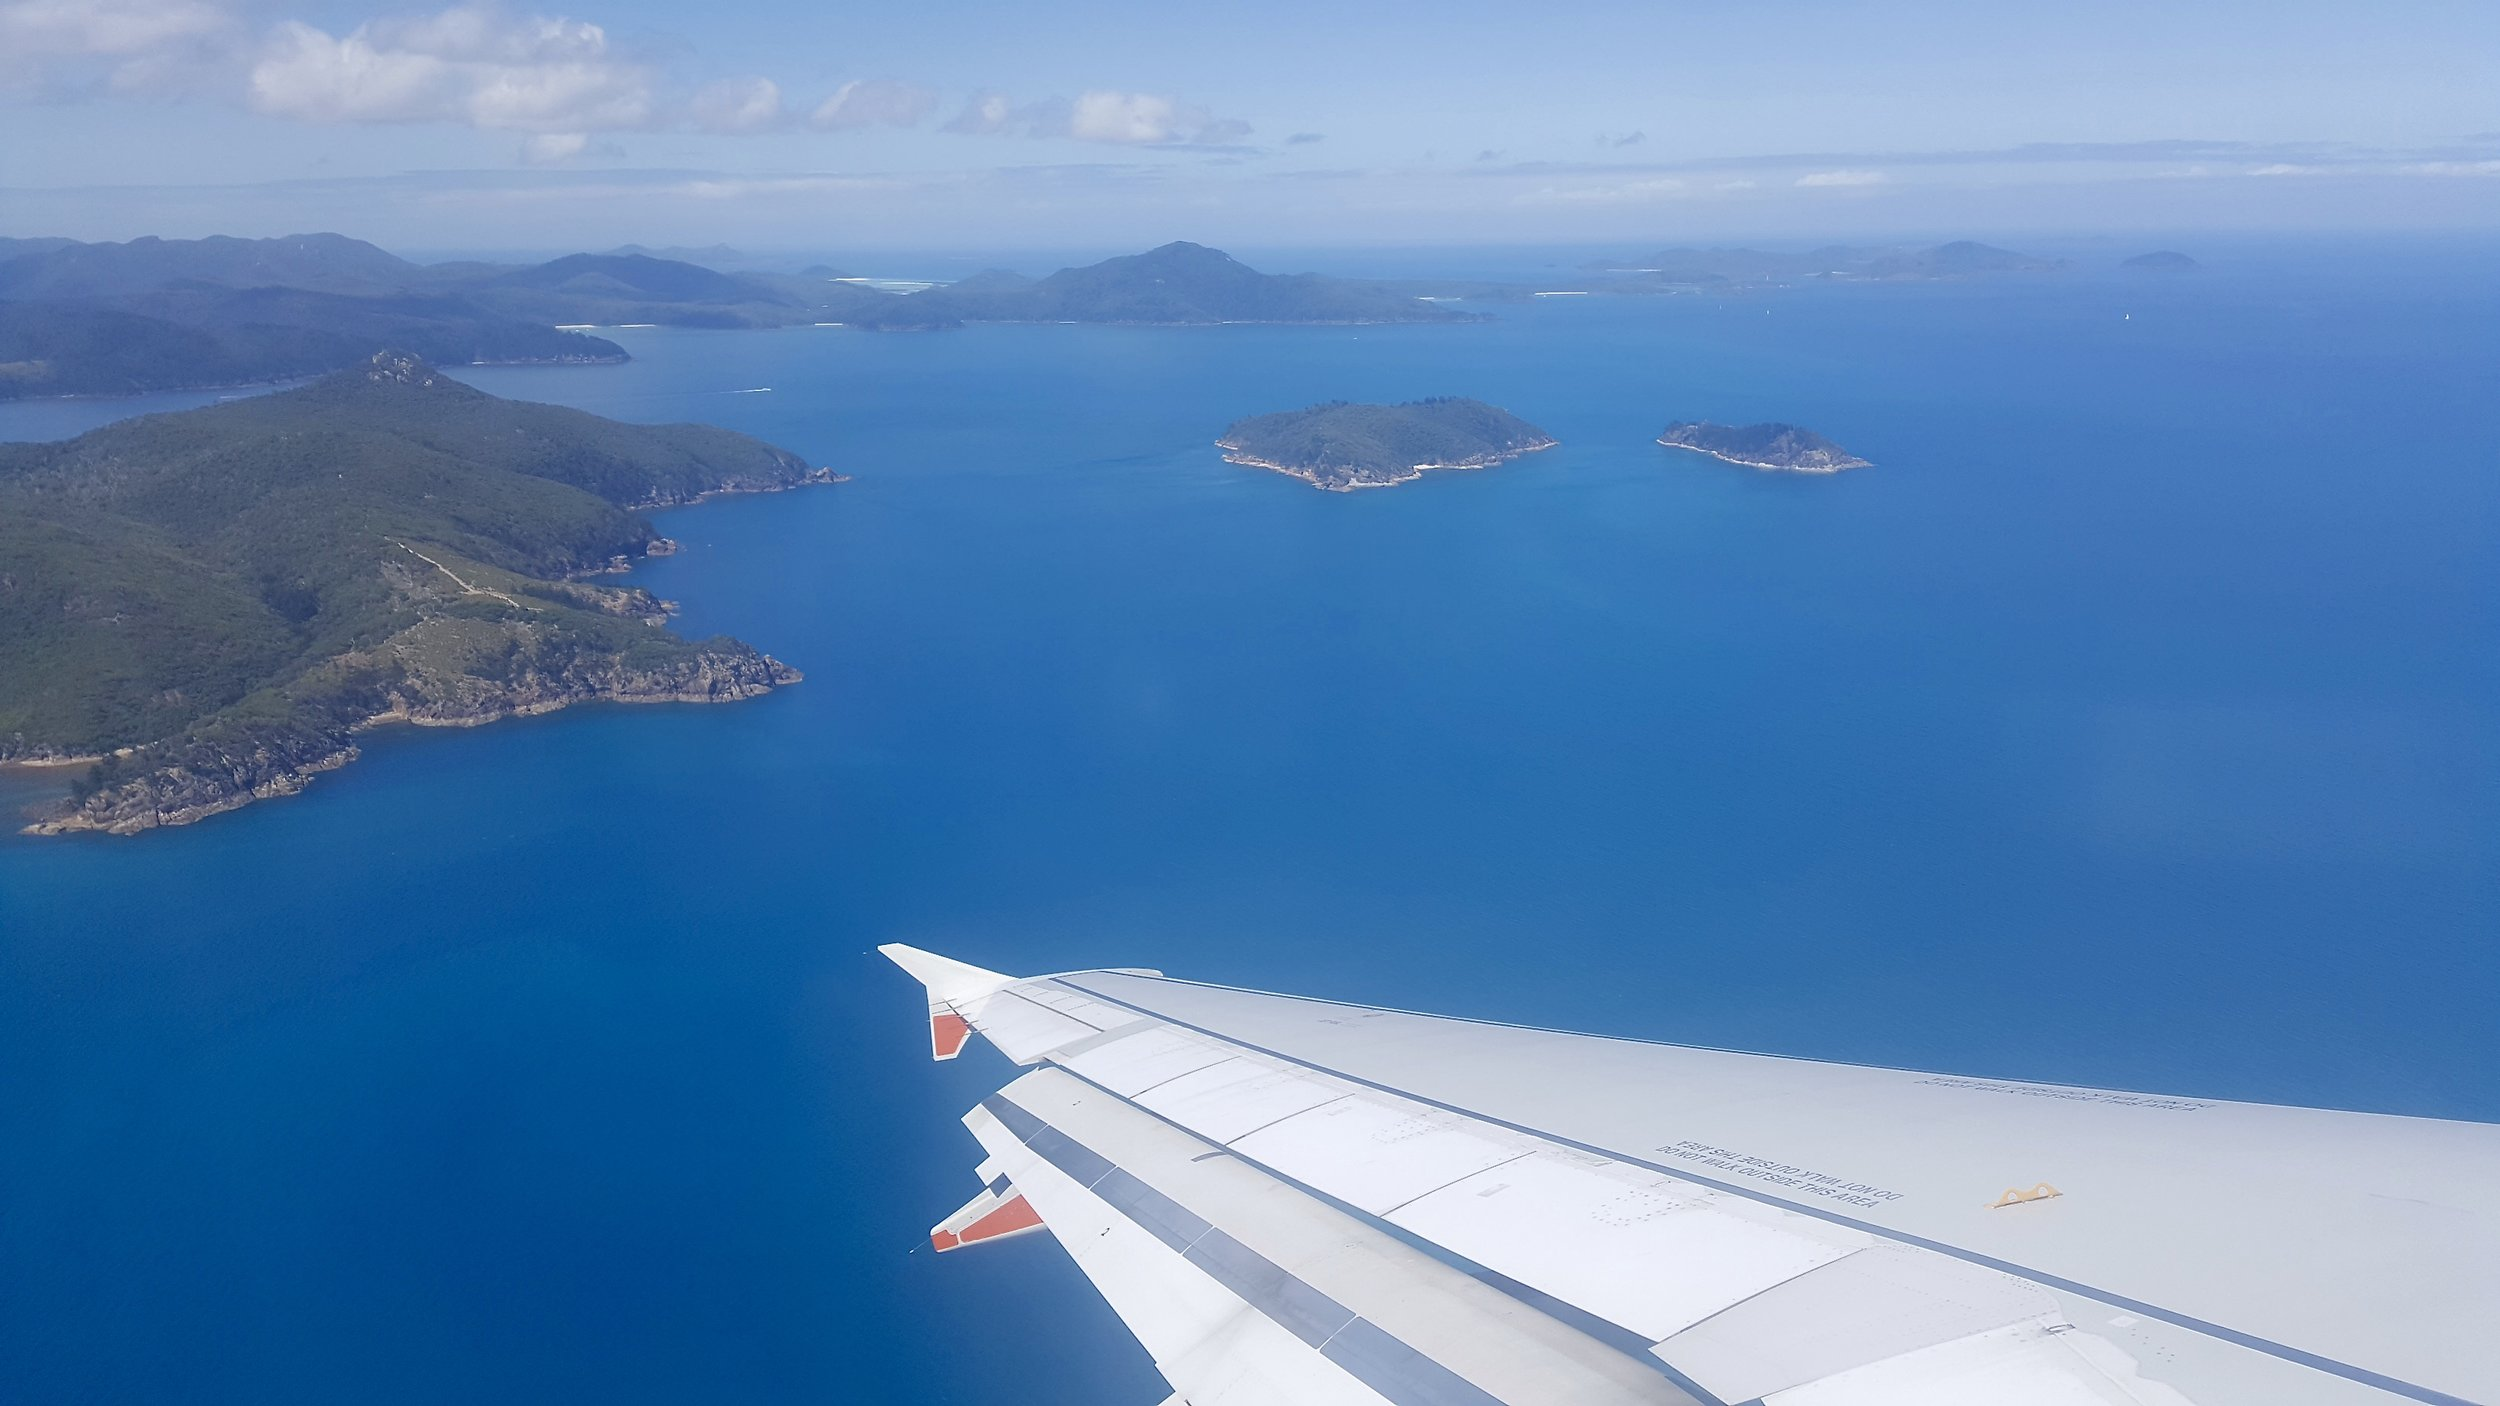 Whitsunday islands, from the aeroplane